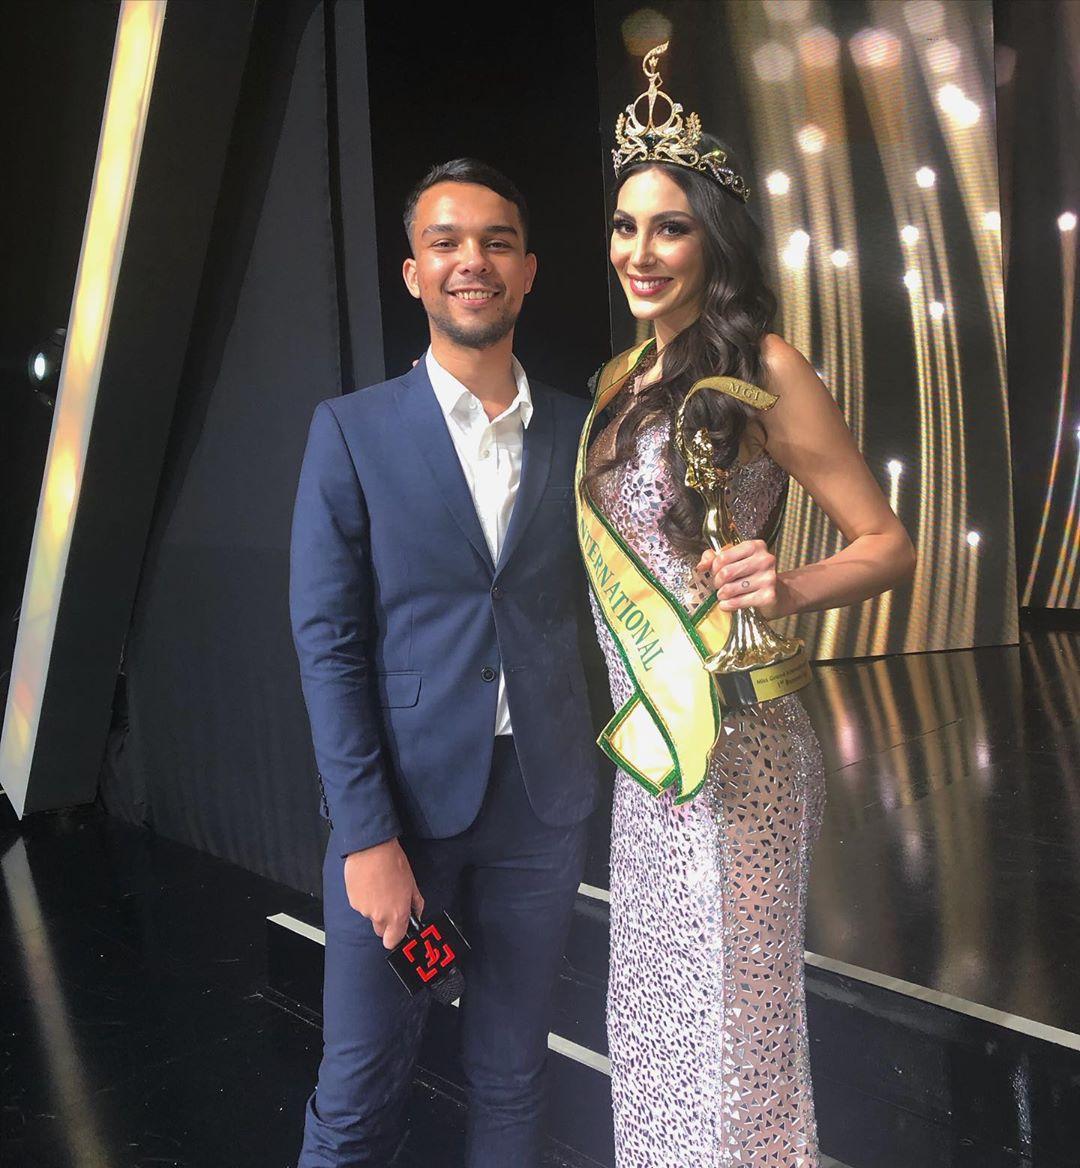 maria malo, 1st runner-up de miss grand international 2019. - Página 18 75379710